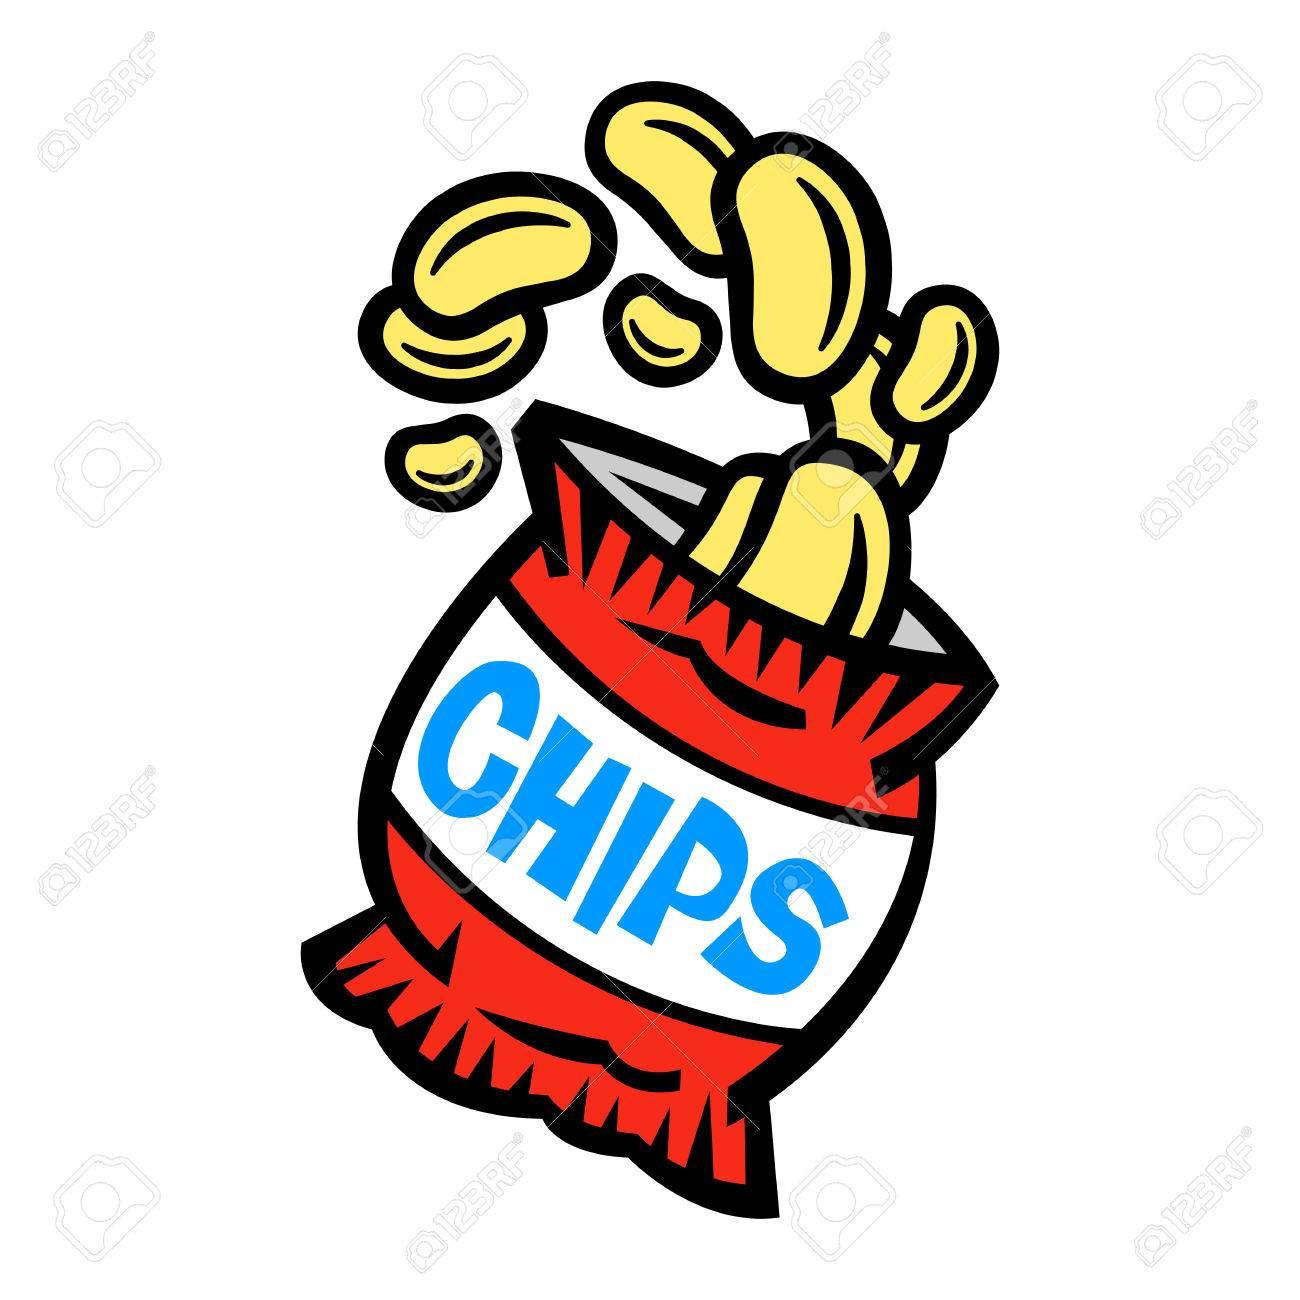 bag of potato chips royalty free cliparts vectors and stock rh 123rf com potato chip bag clip art lays potato chips clip art